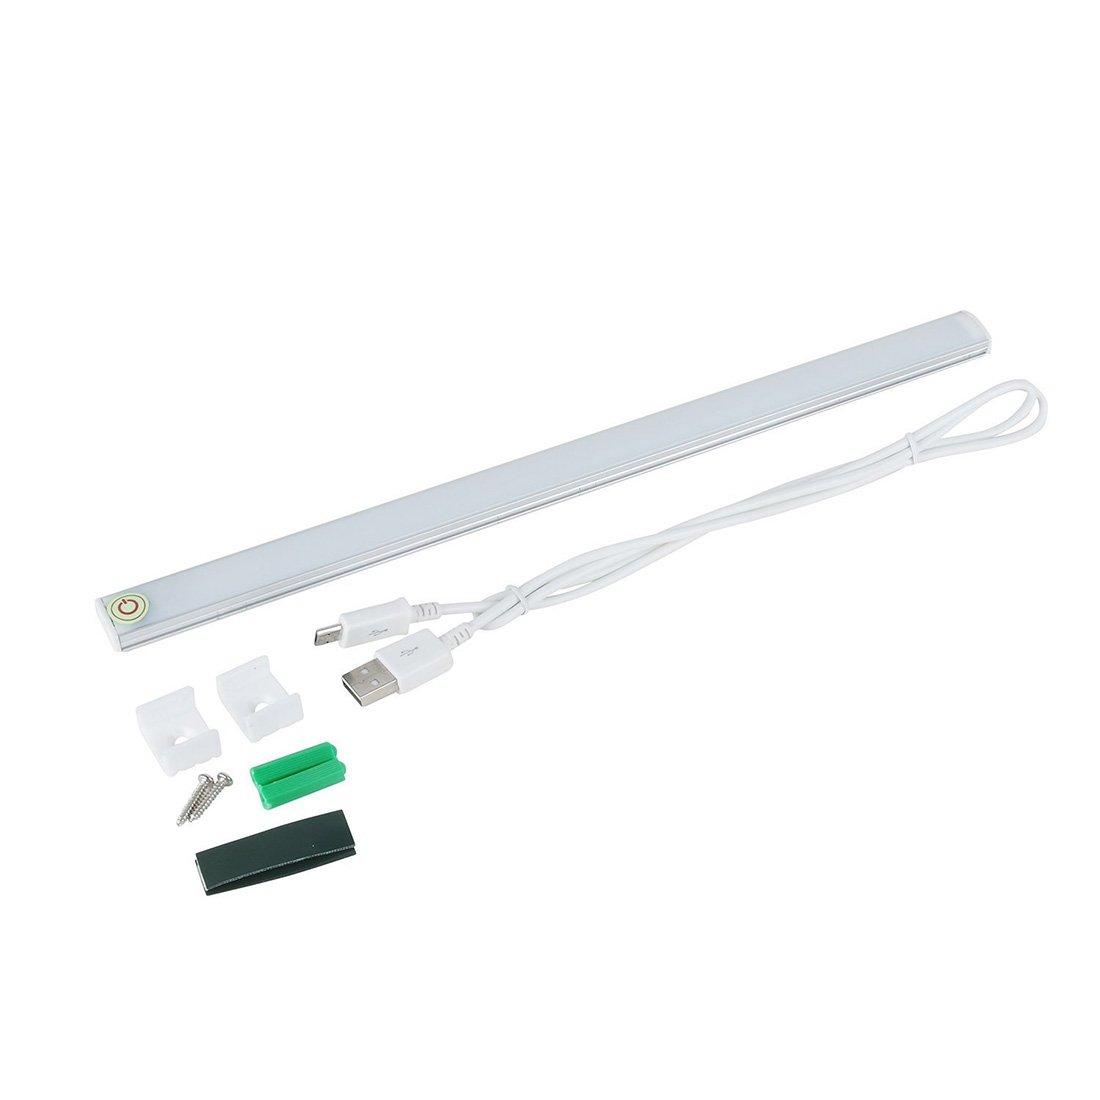 Novadeal 11.8 Inch 21-LED Closets Cabinet LED Night Light Usb Power Wireless Motion Sensing Sensor Light for Attics, Hallway, Washroom